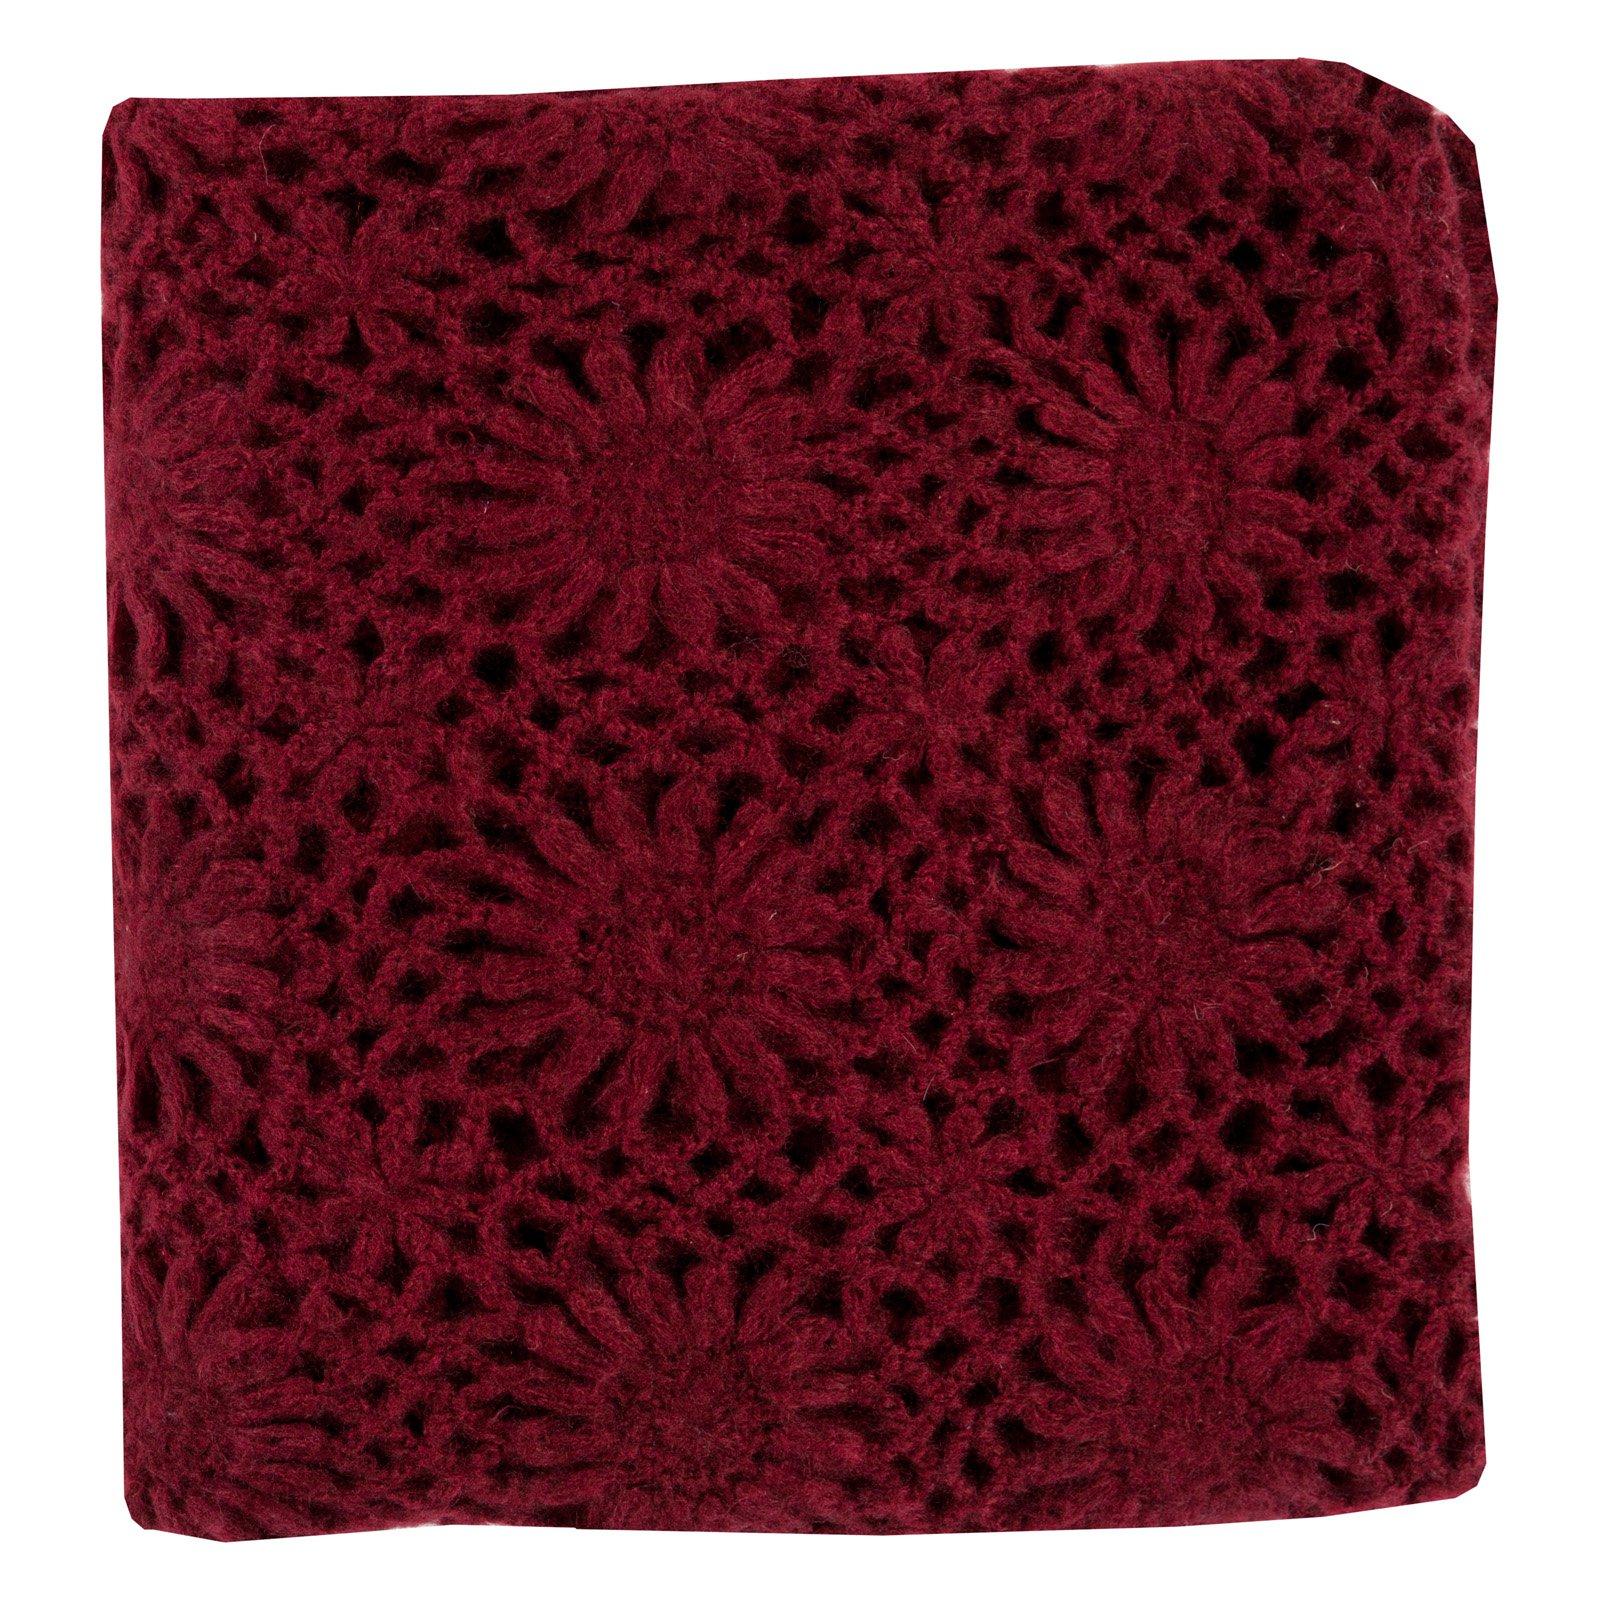 Surya Teresa Crochet Throw - 50L x 60W in.